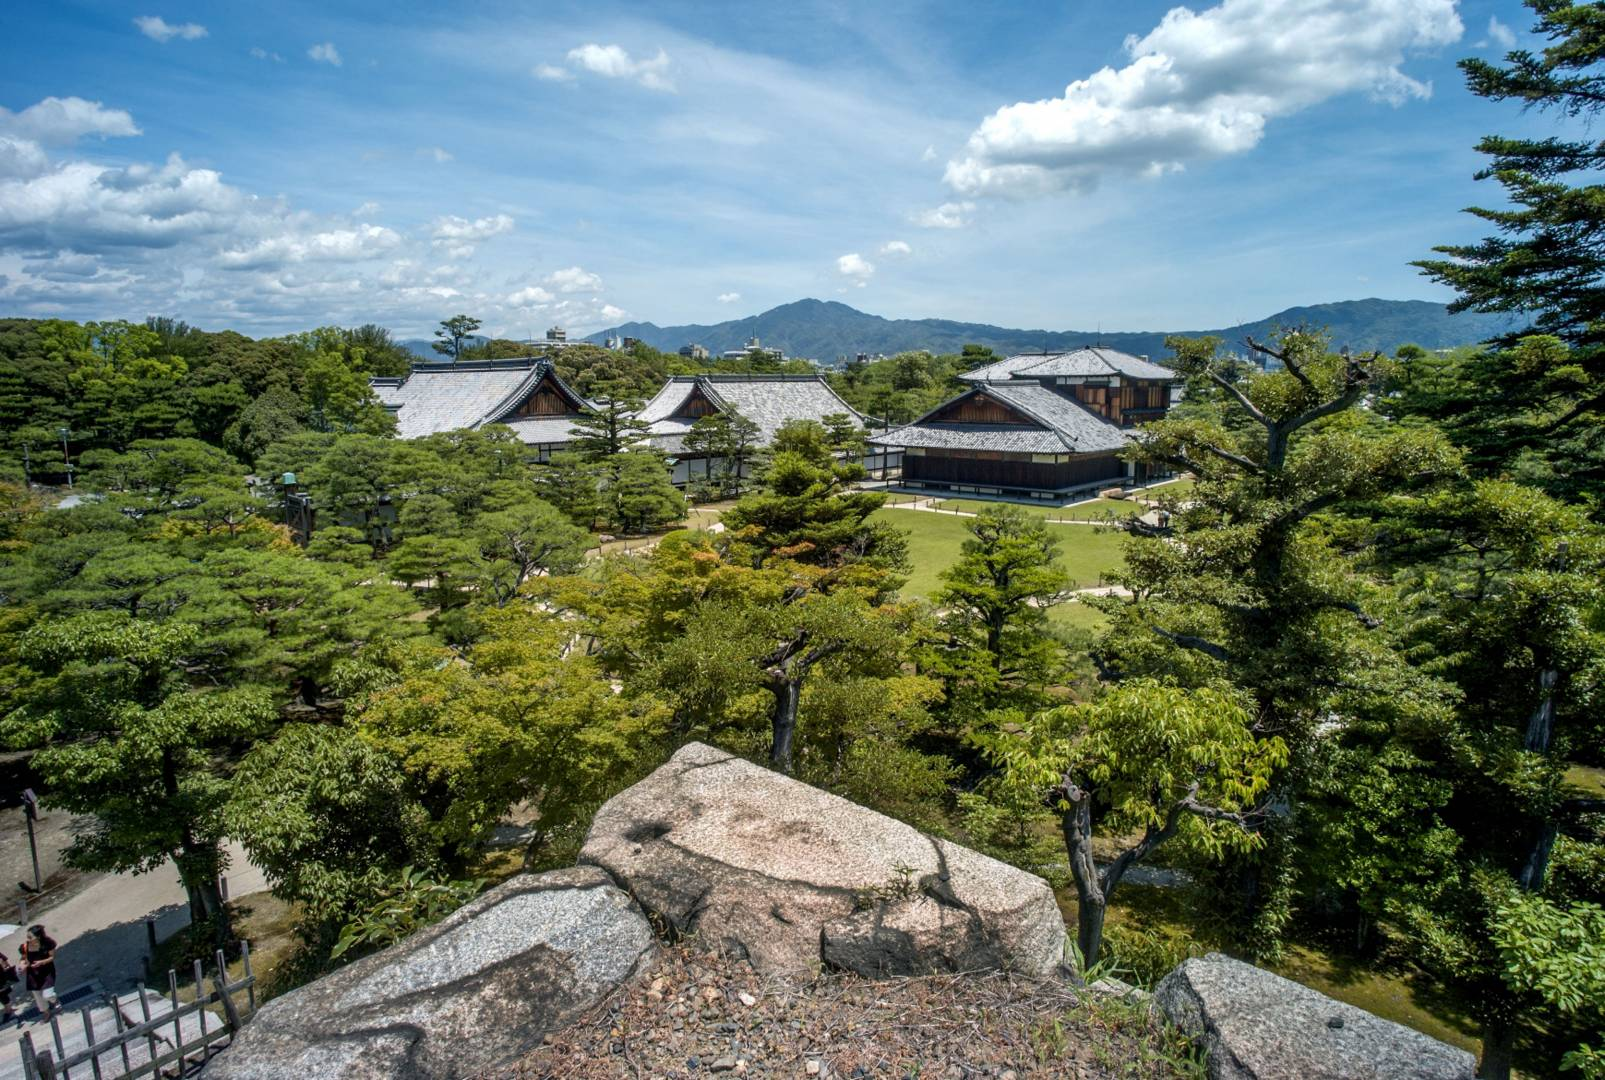 Ninomaru Palace Kyoto, Leica M8 28mm Voigtländer 1.9